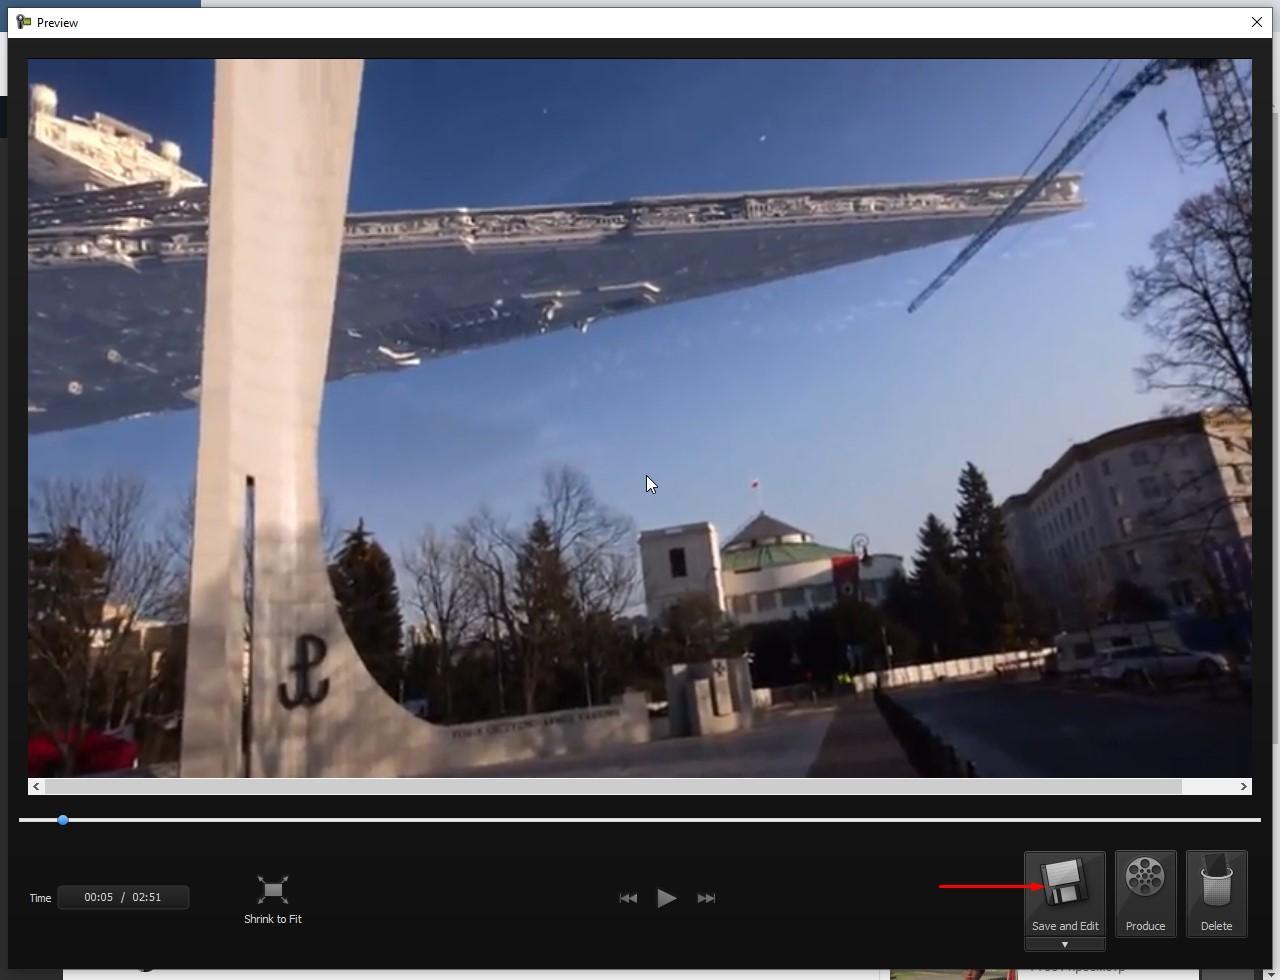 Окно с предосмотром видео